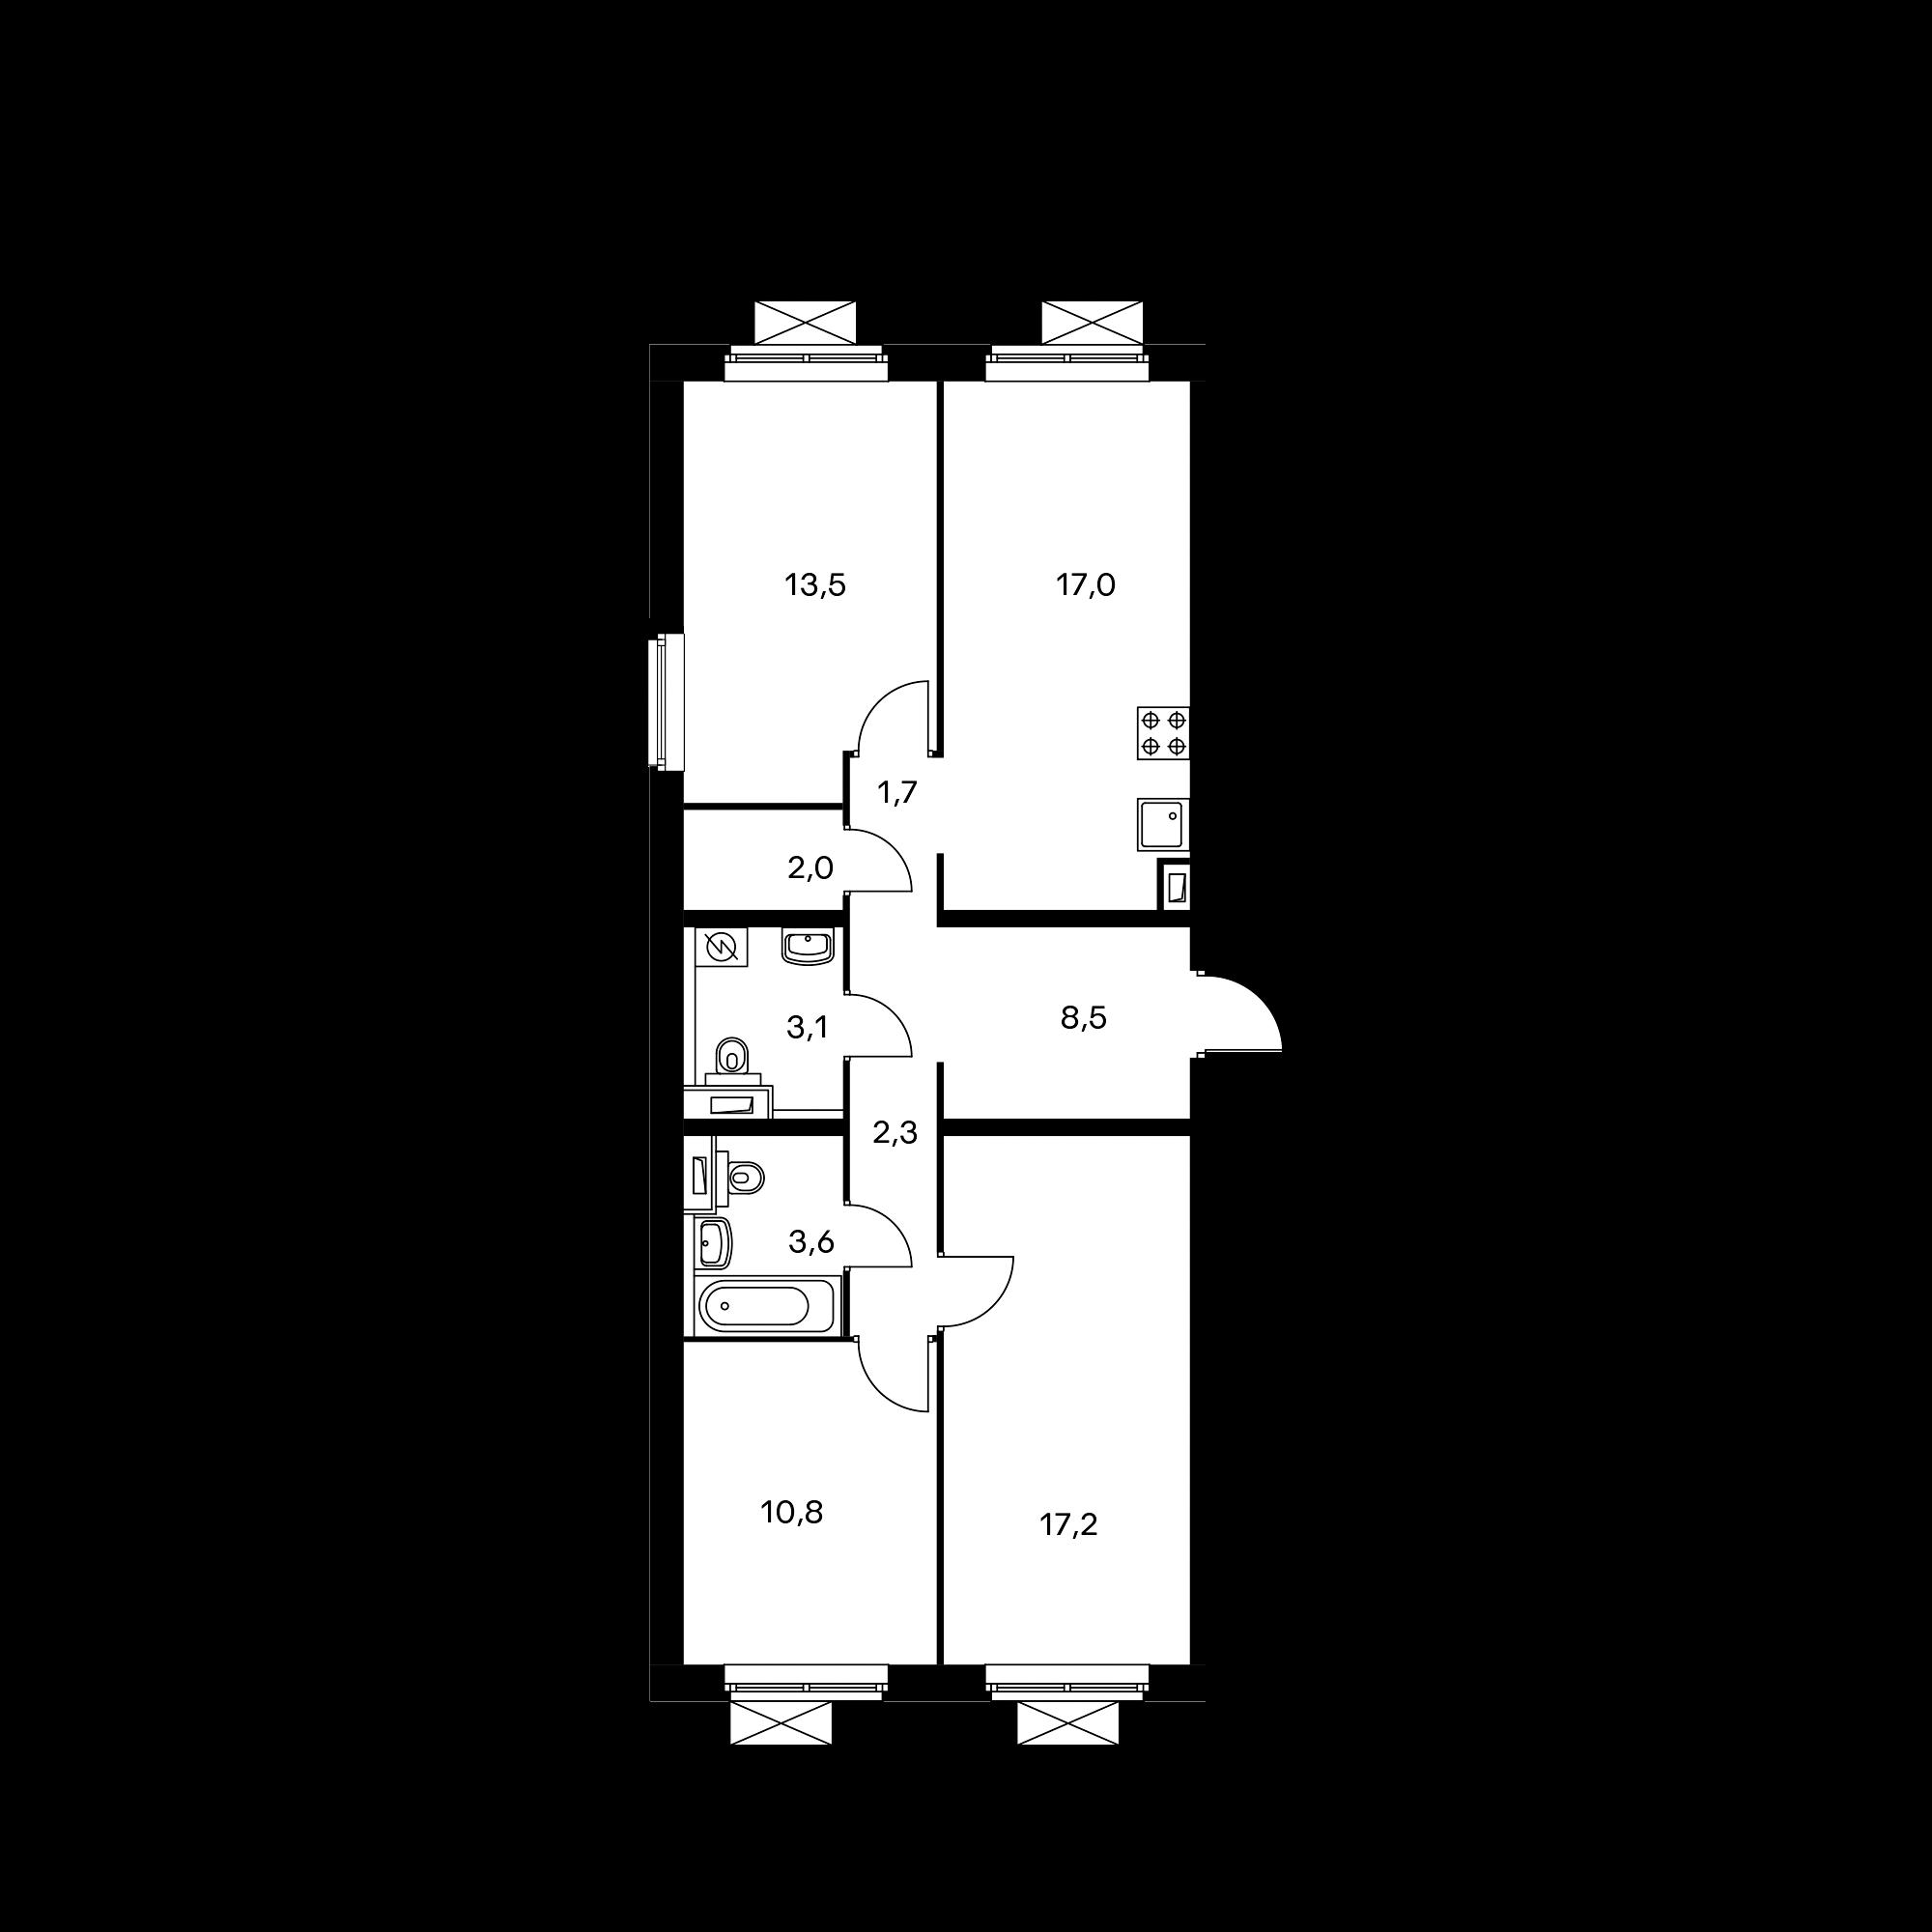 3KM16_6.0-1_T